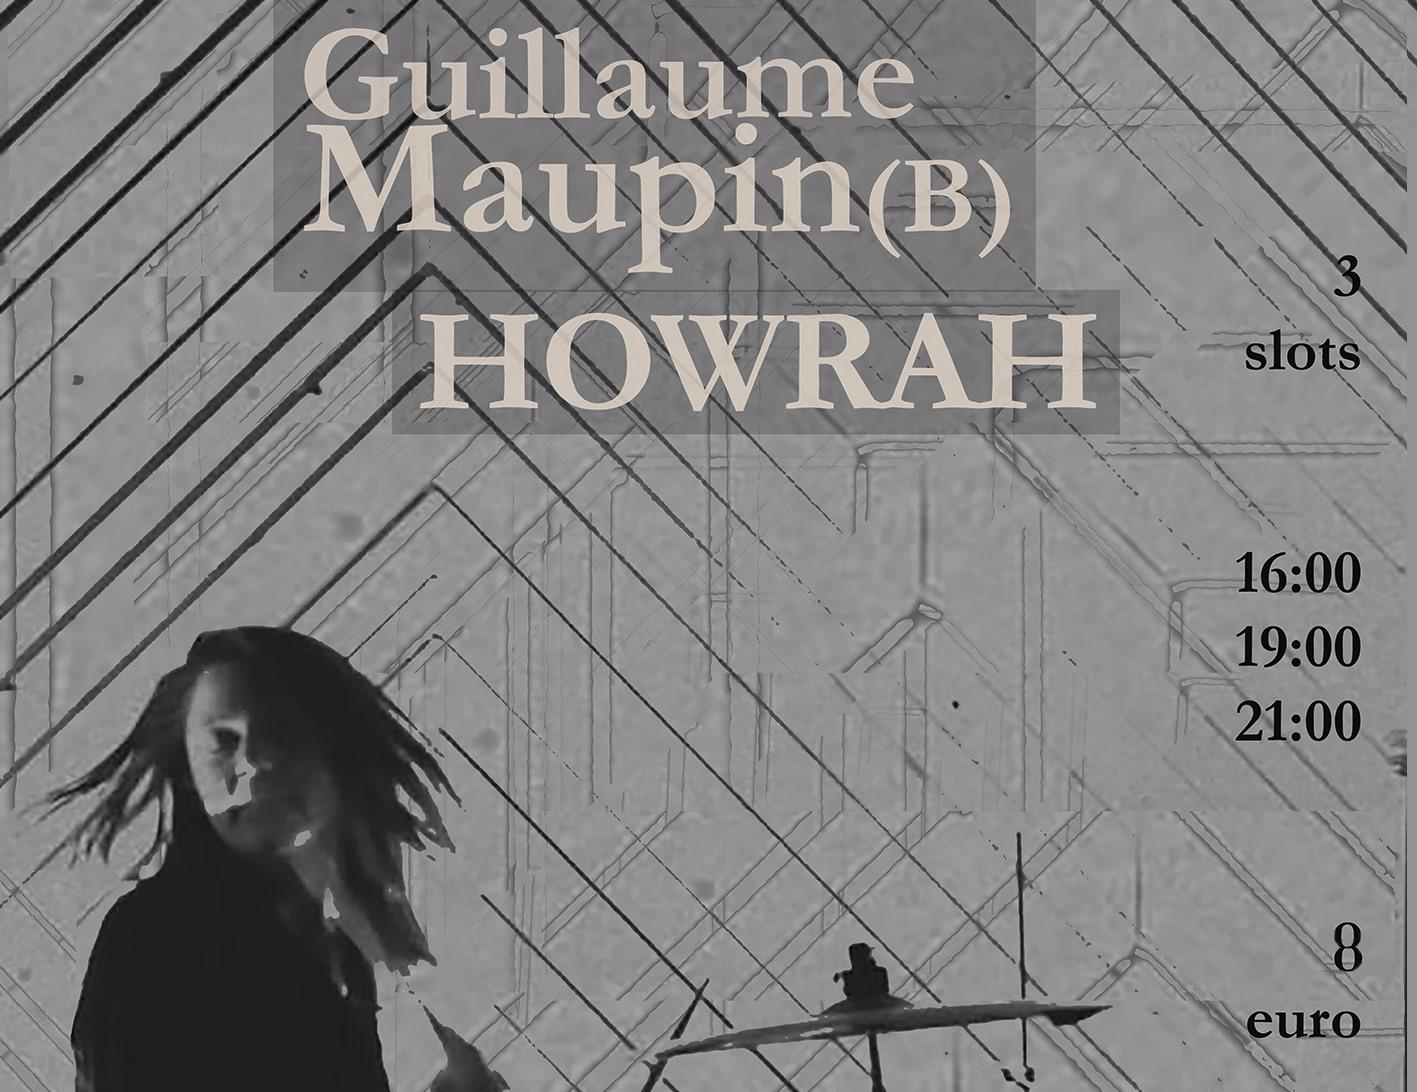 HOWRAH + GUILLAUME MAUPIN (B)